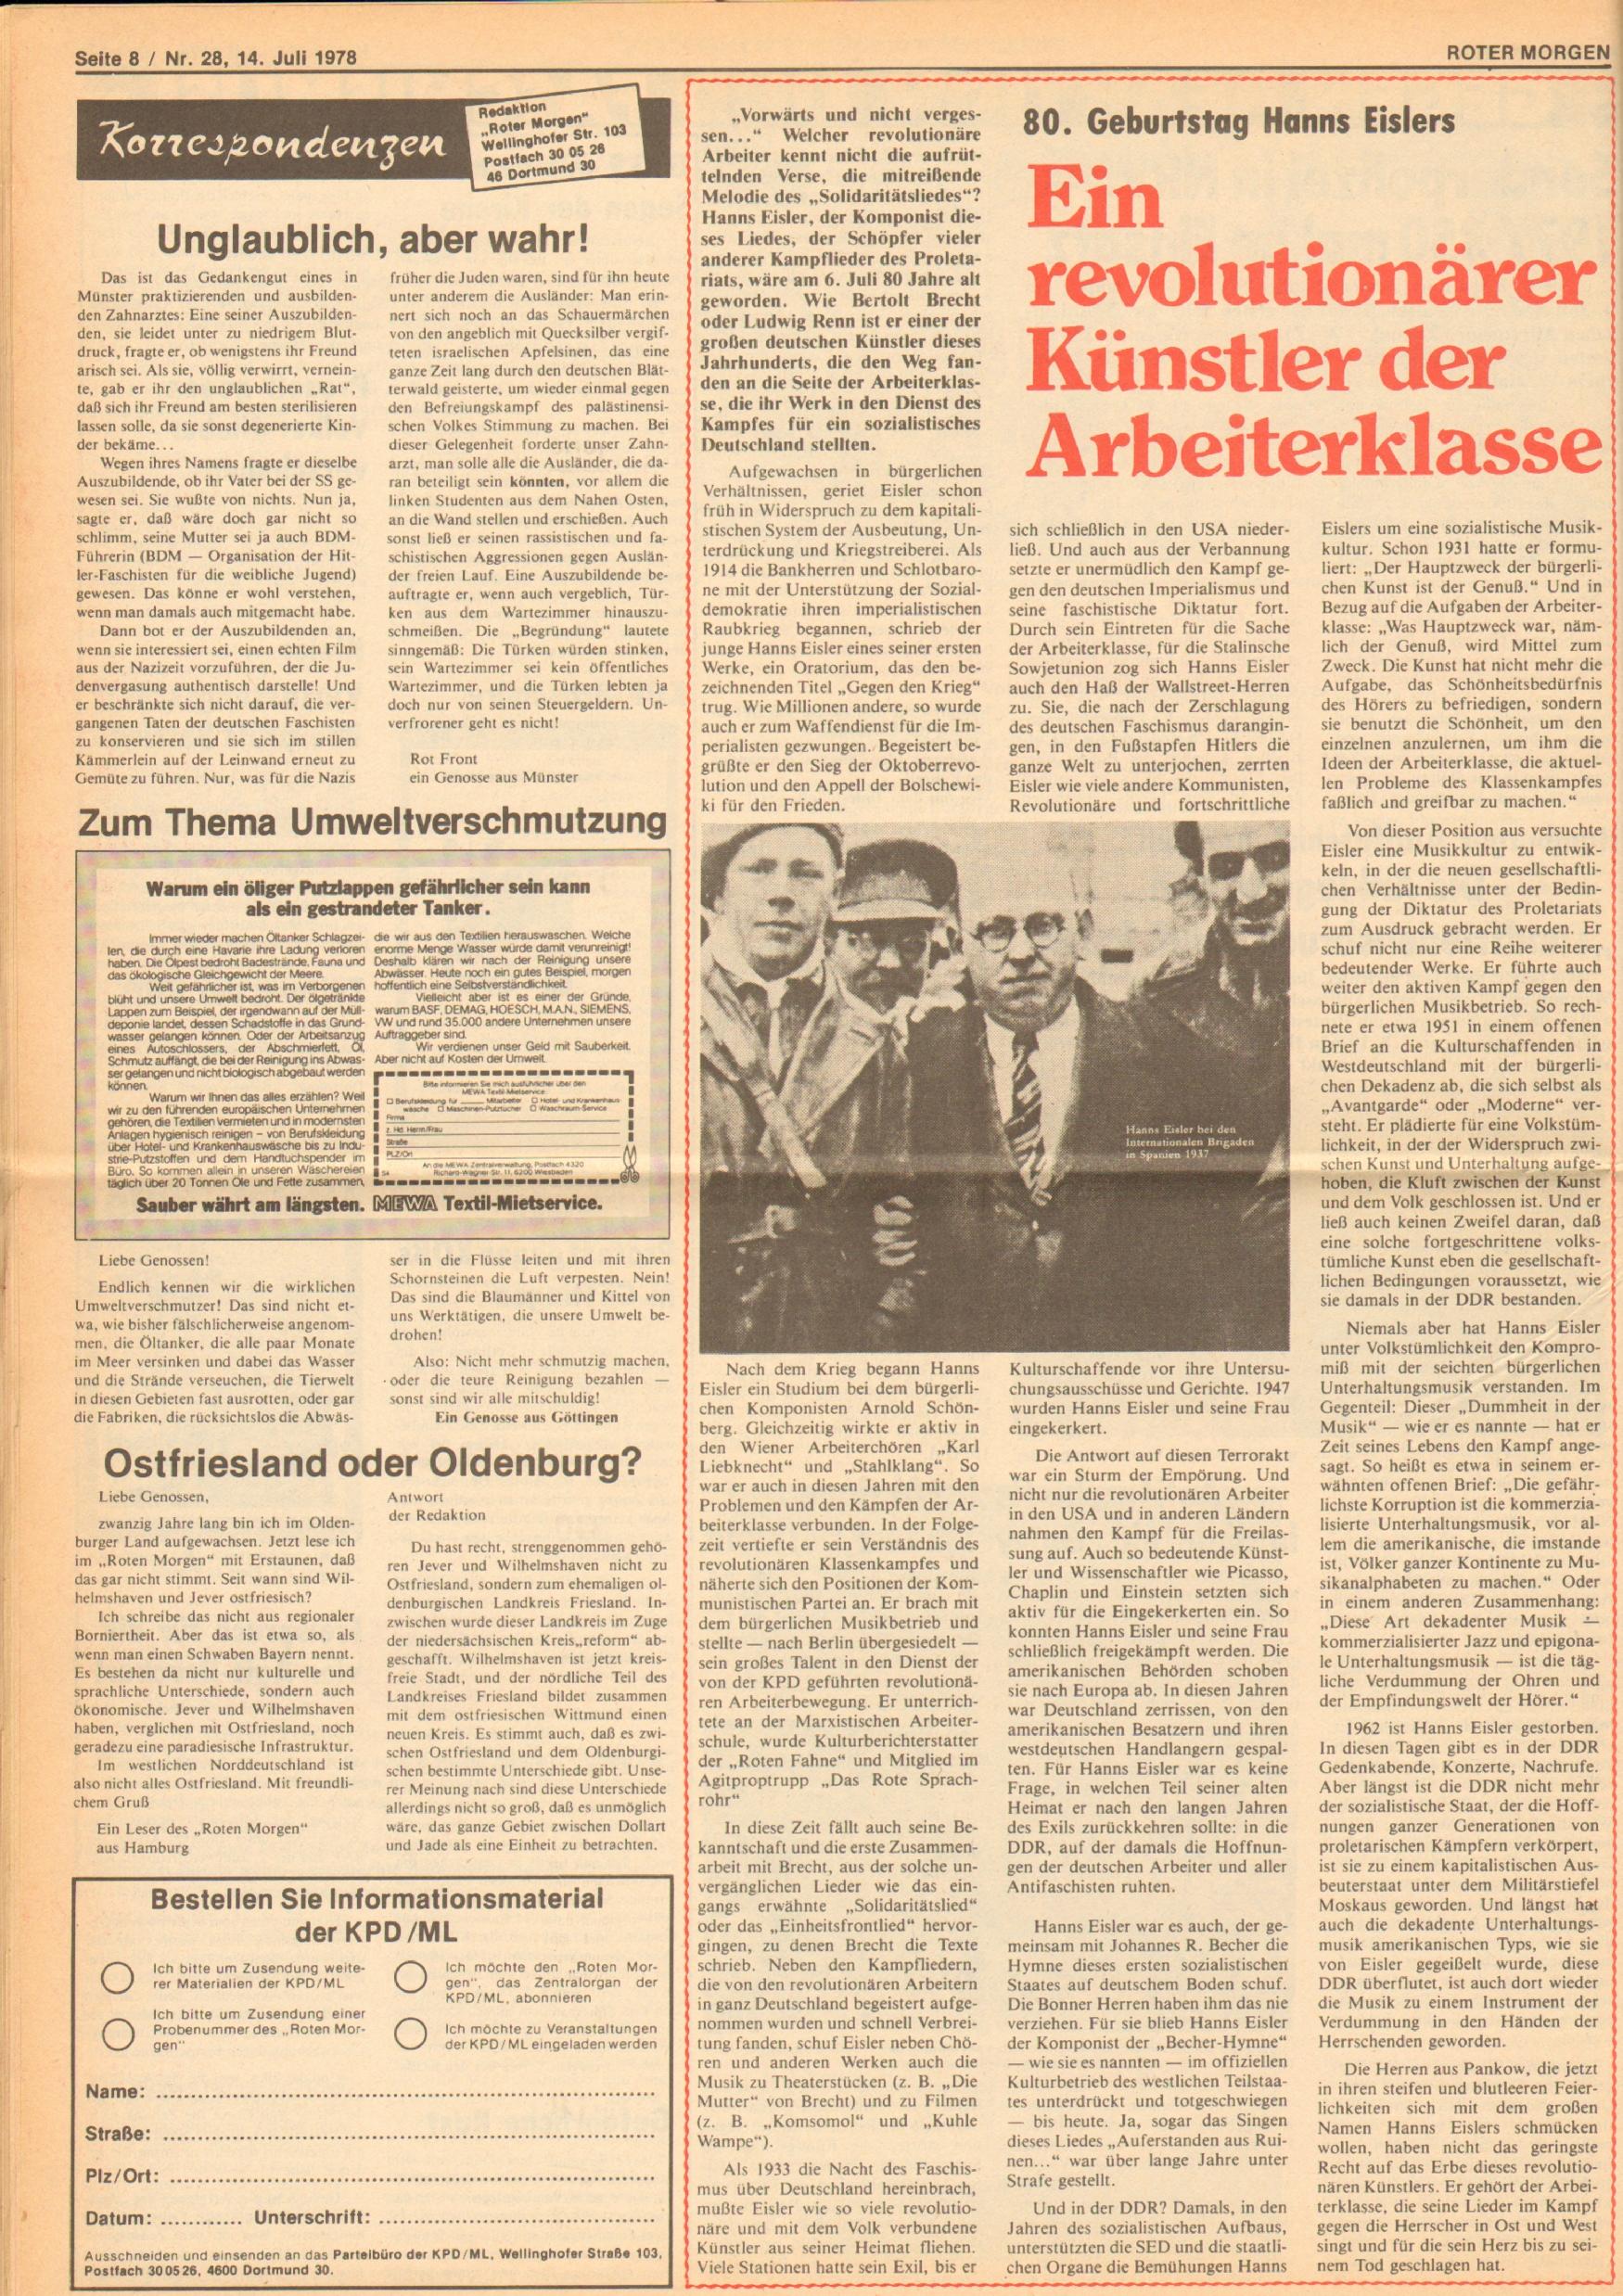 Roter Morgen, 12. Jg., 16. Juli 1978, Nr. 28, Seite 8